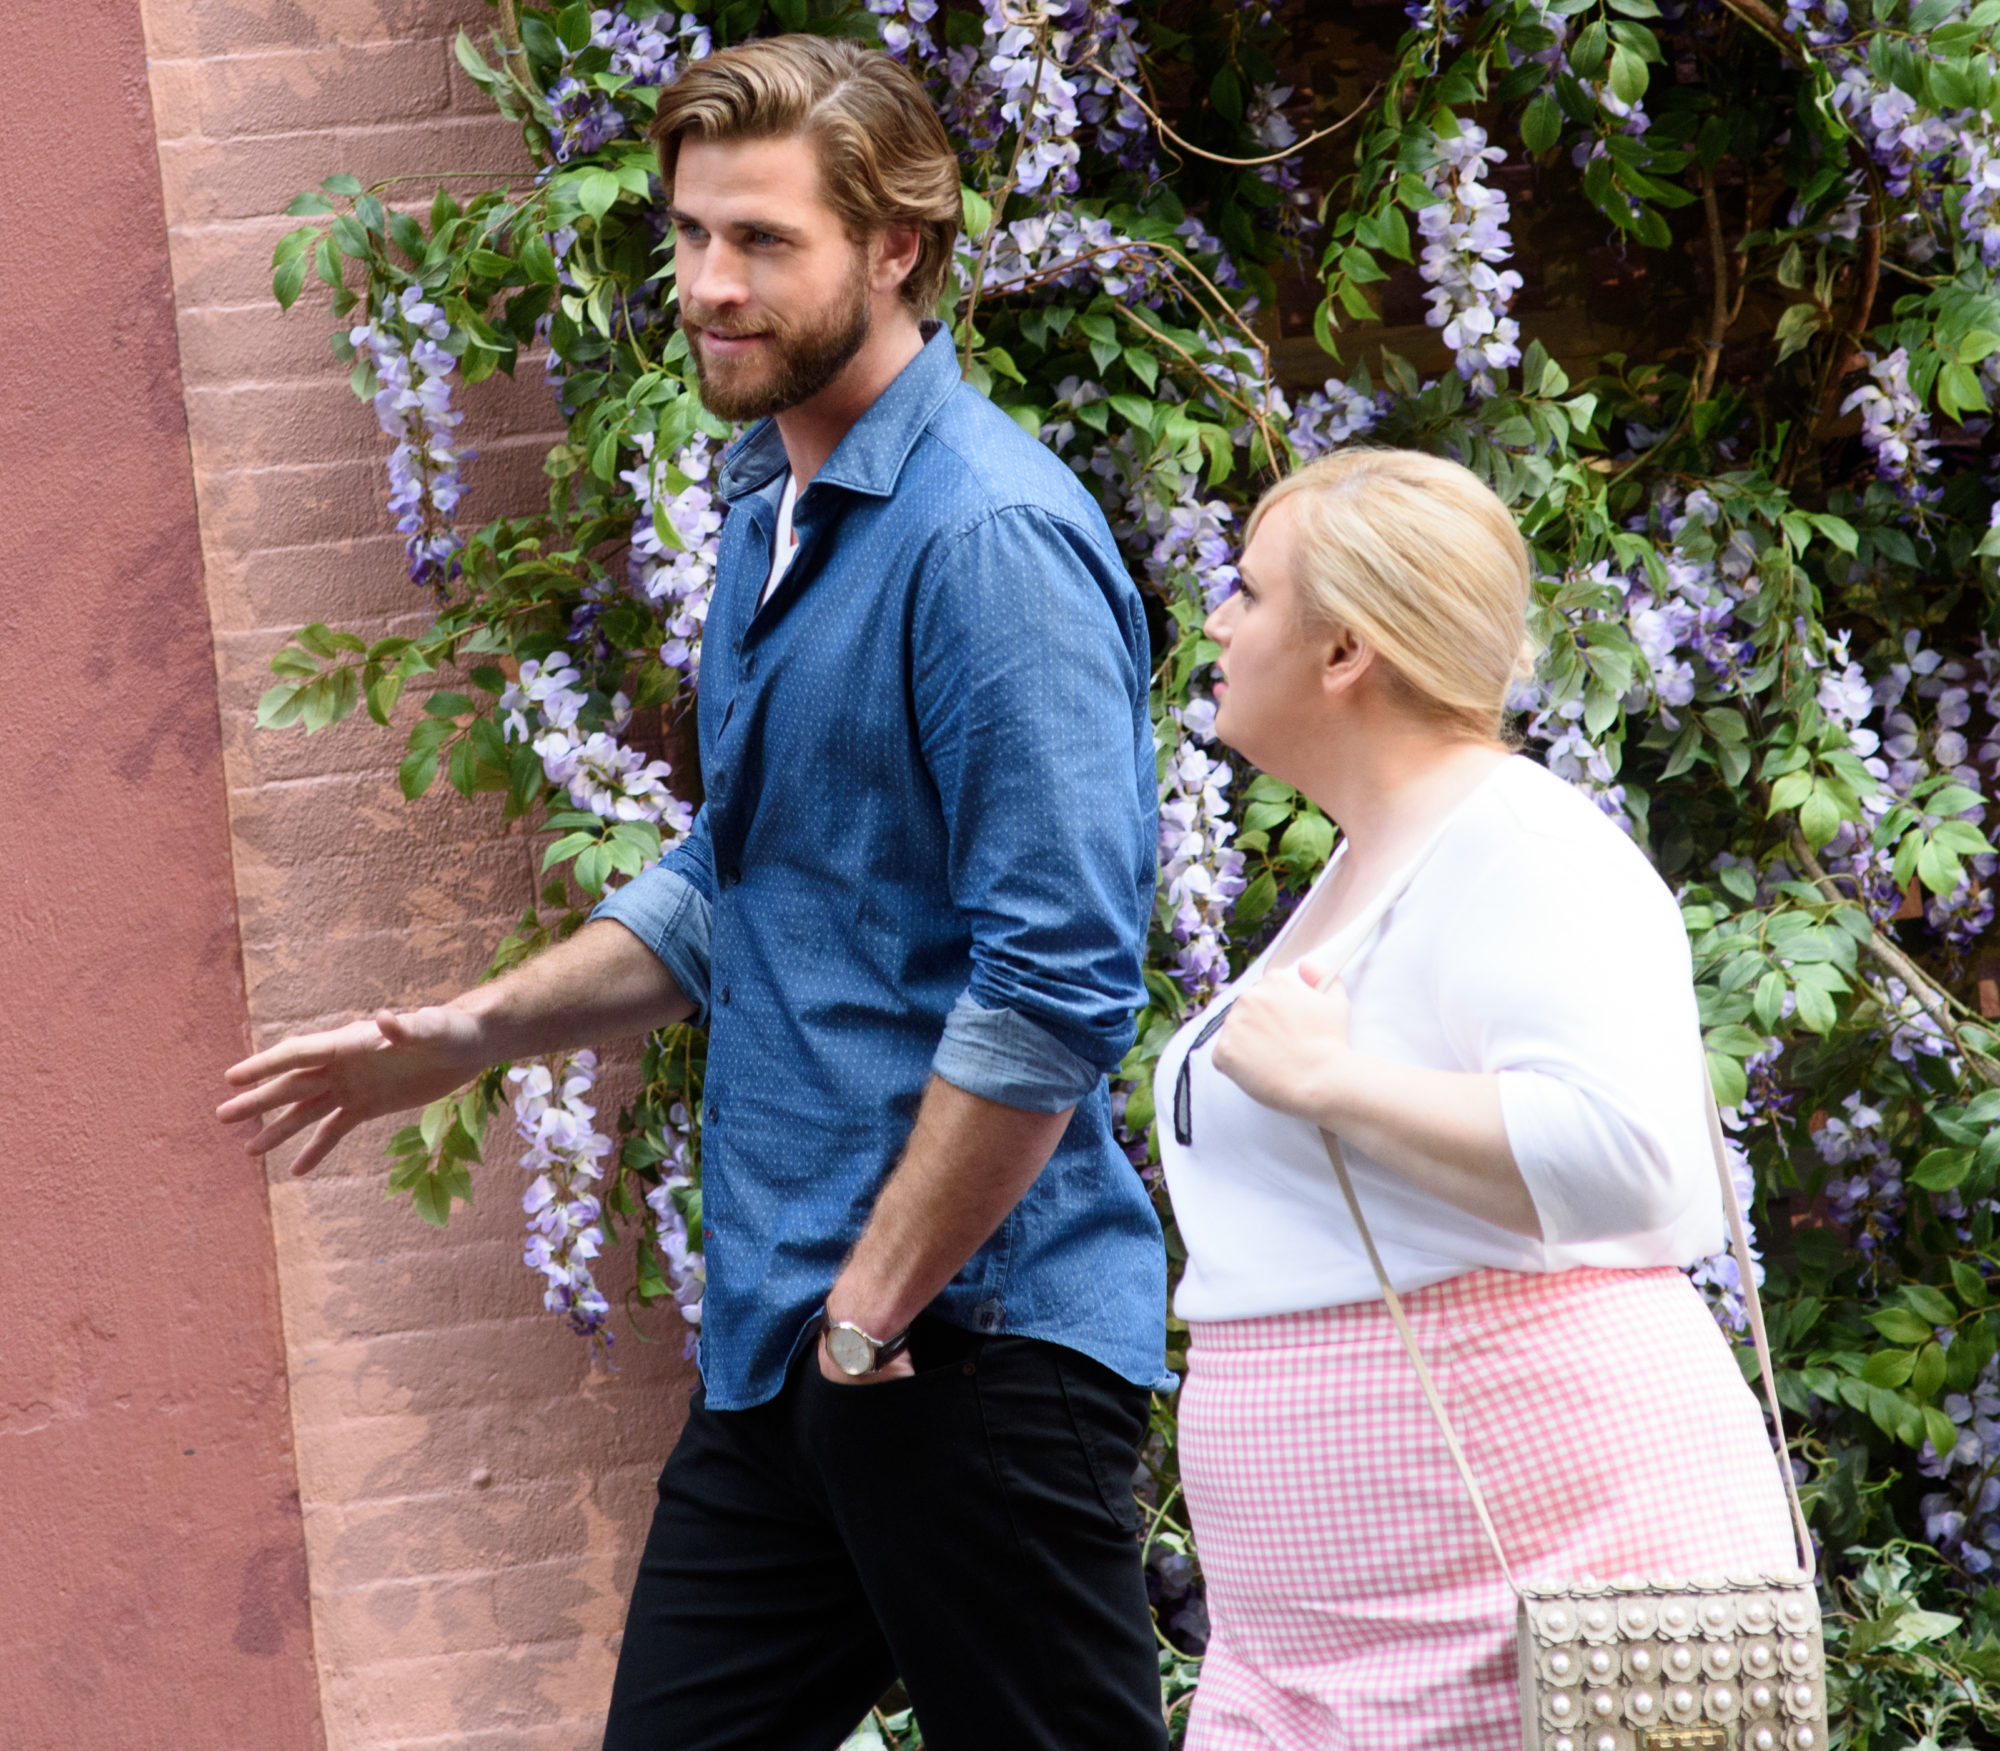 Liam Hemsworth Dawn Of A Rebel: Rebel Wilson 與 Liam Hemsworth 主演《Isn't It Romantic》,顛覆愛情電影